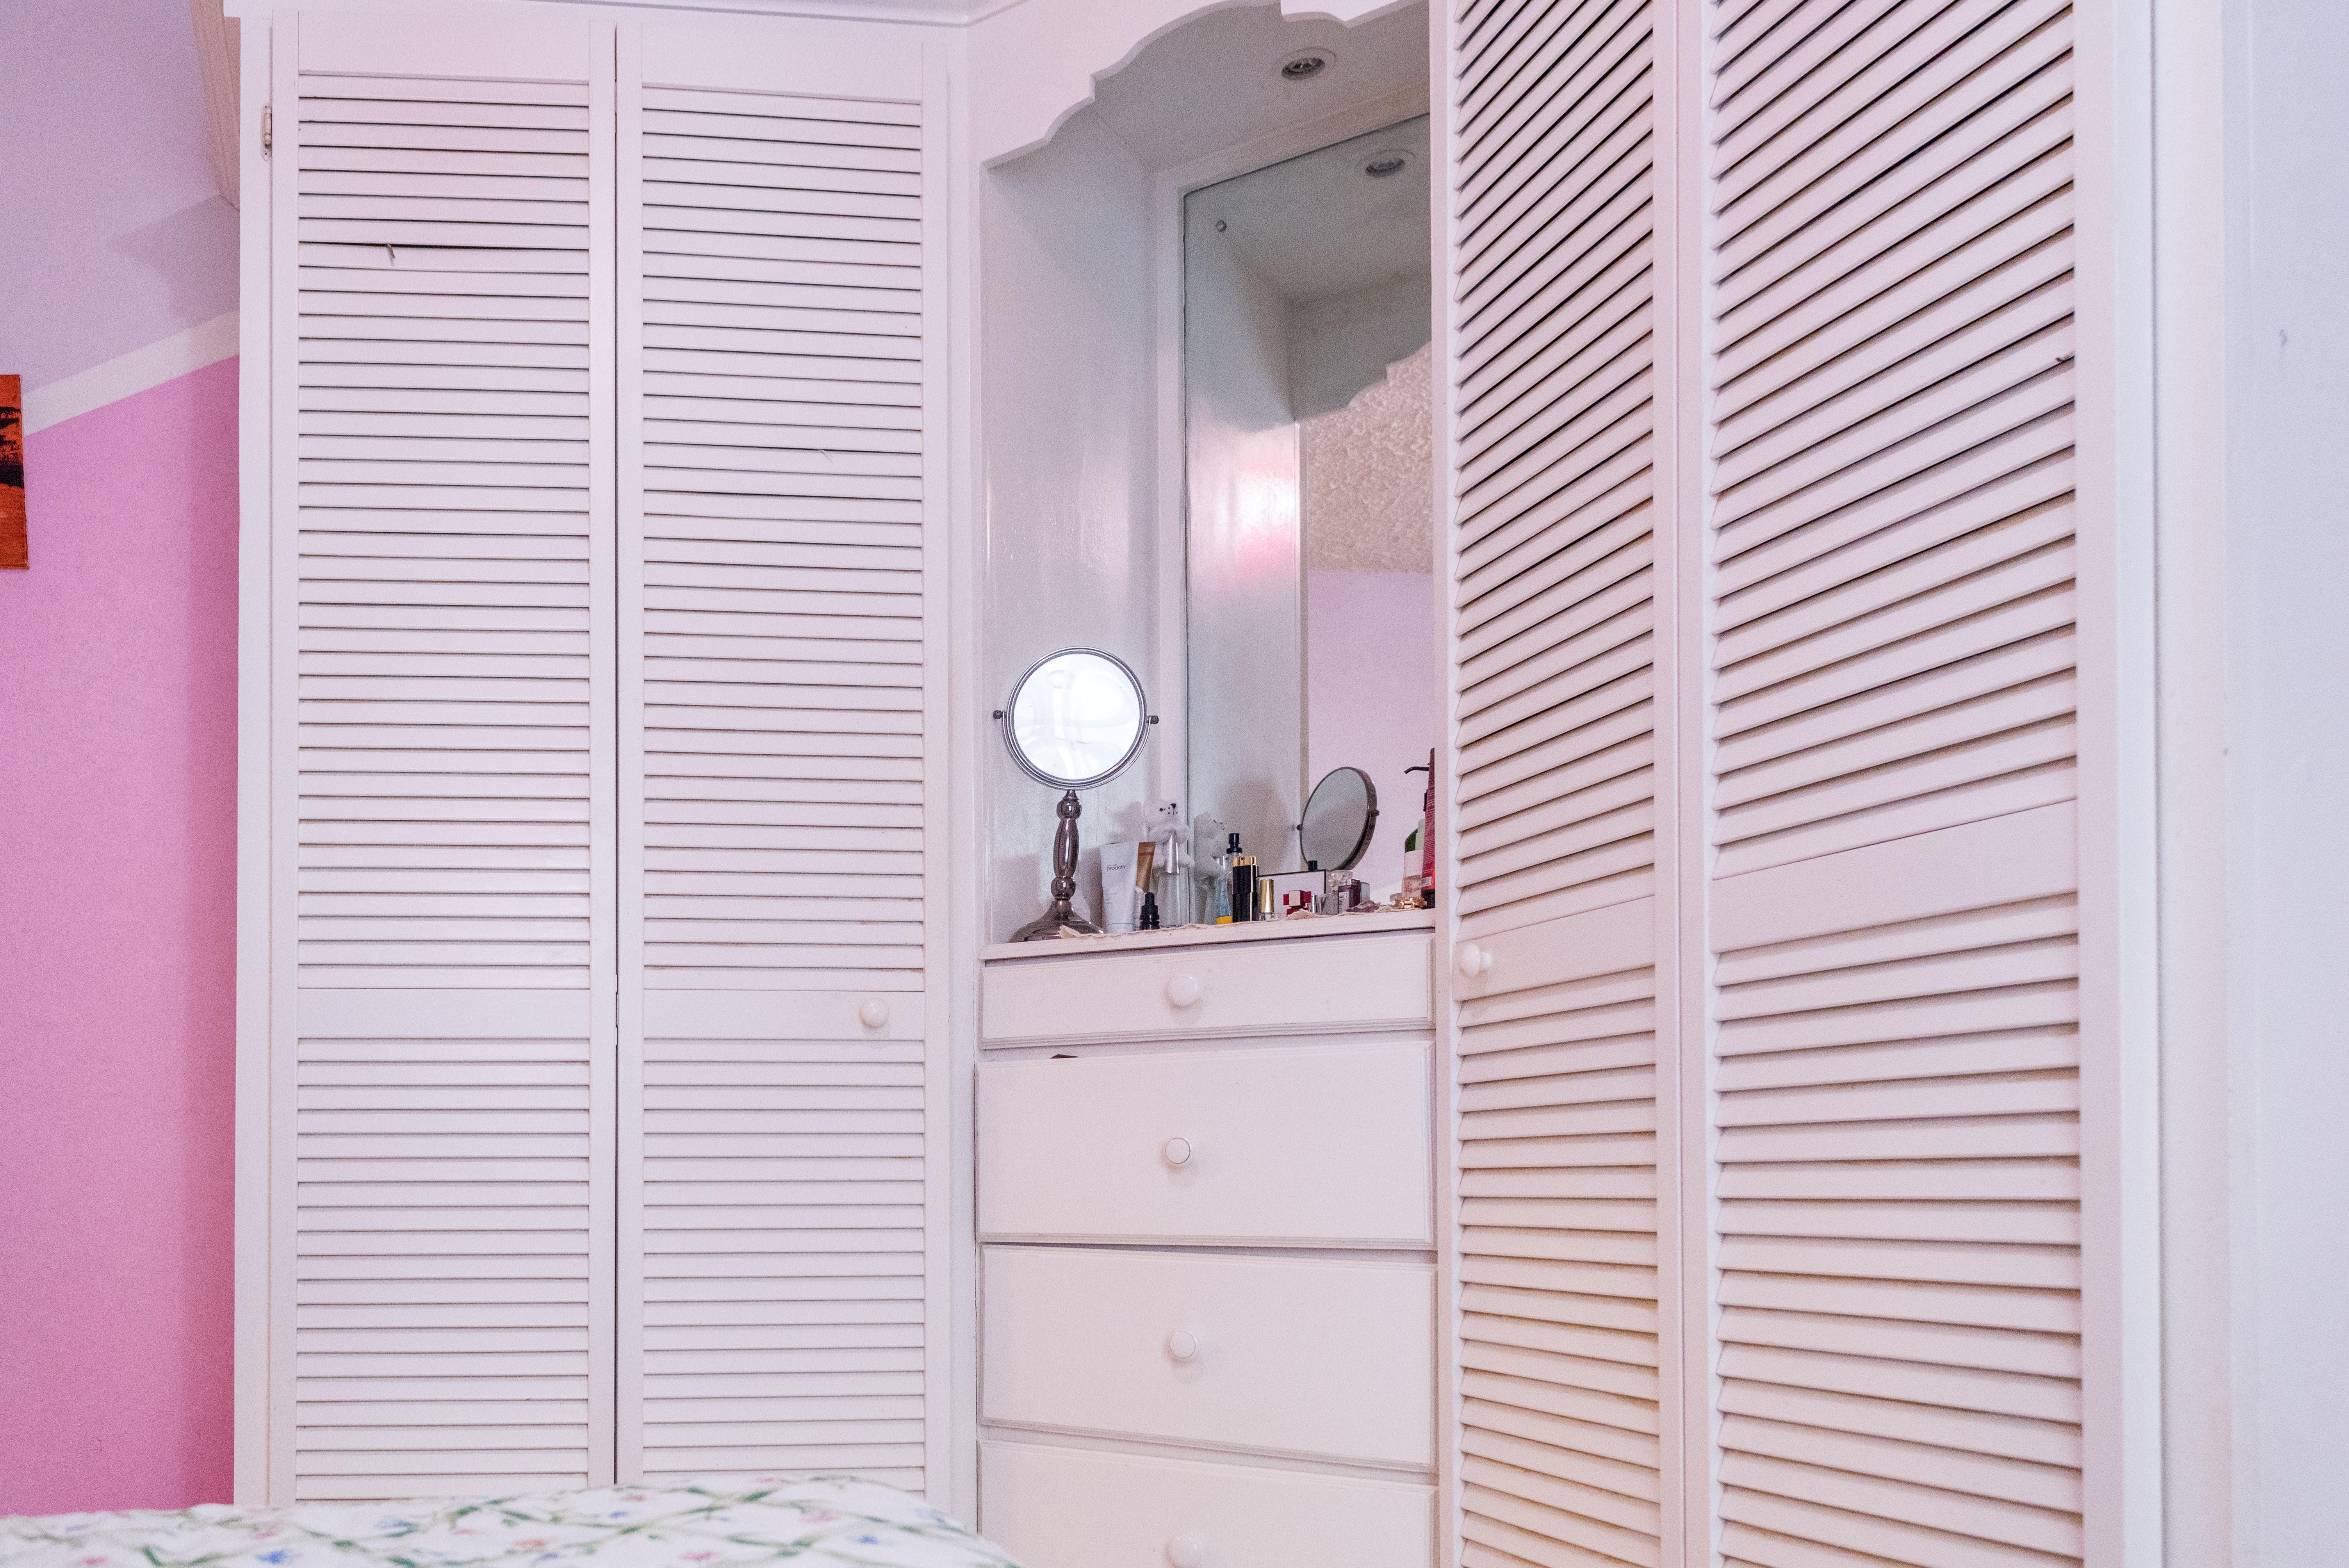 EMERALD LIVING | Built-in Closet